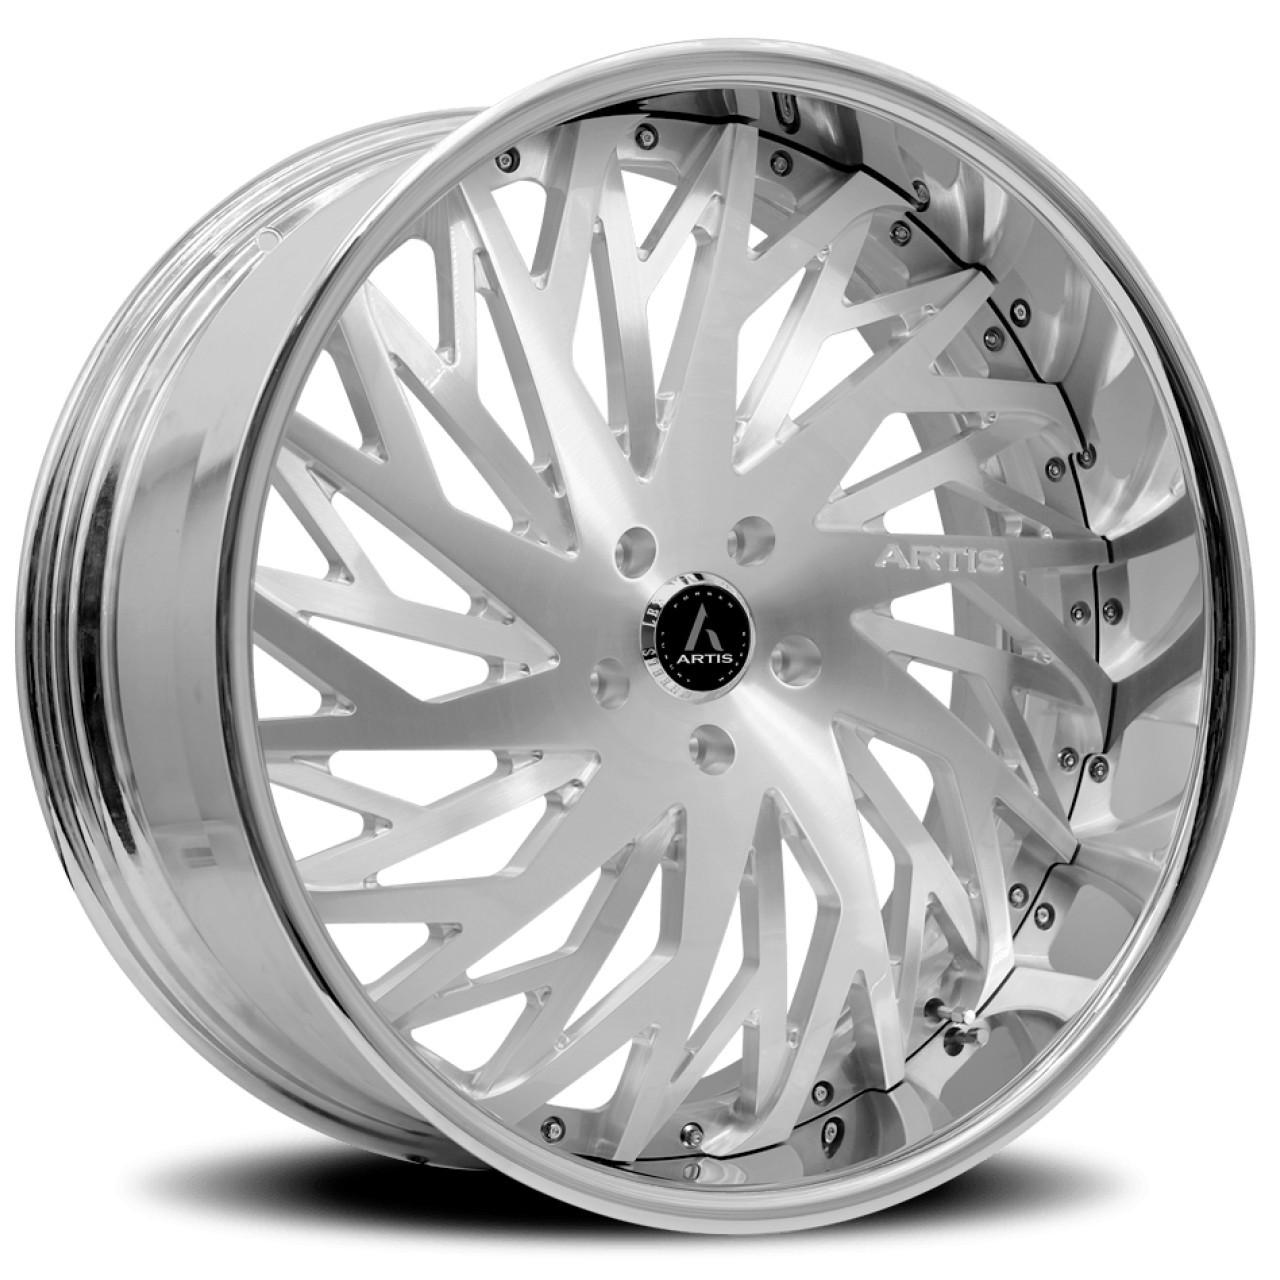 Artis Northtown forged wheels